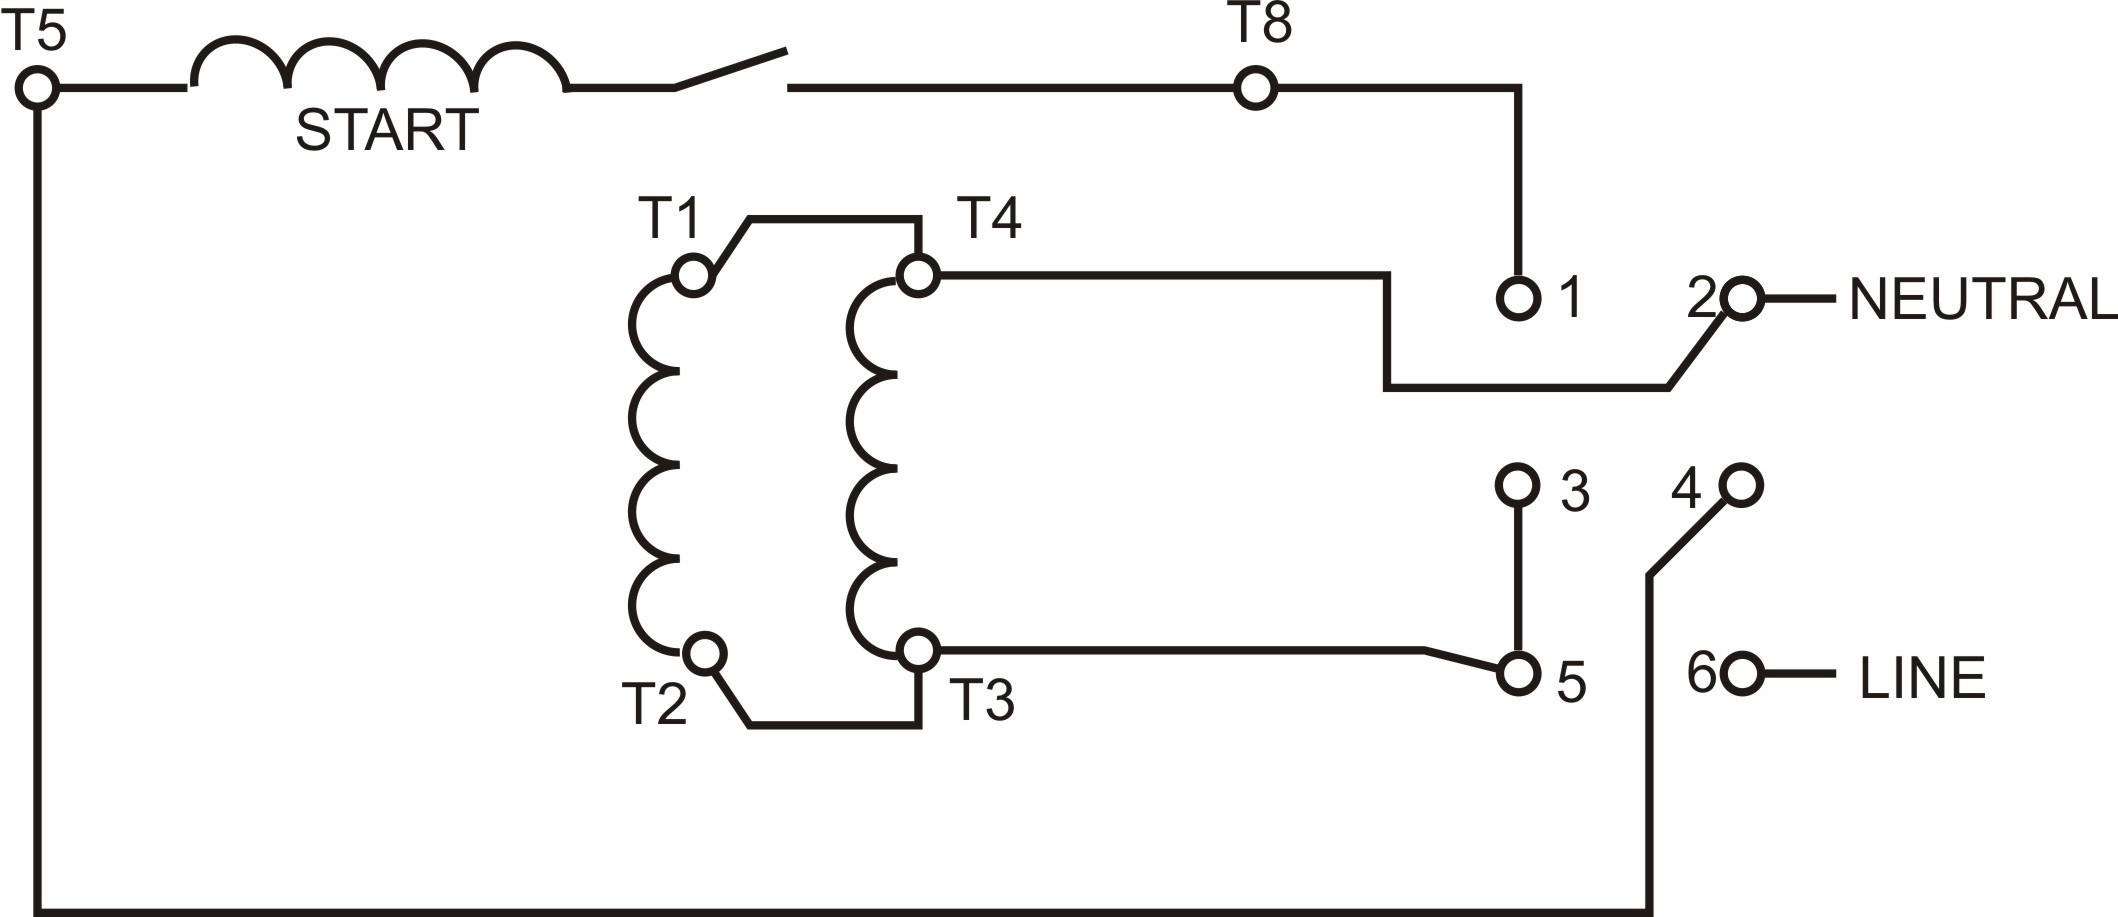 110 220 Motor Wiring Diagram | Manual E-Books - Electric Motor Wiring Diagram 110 To 220